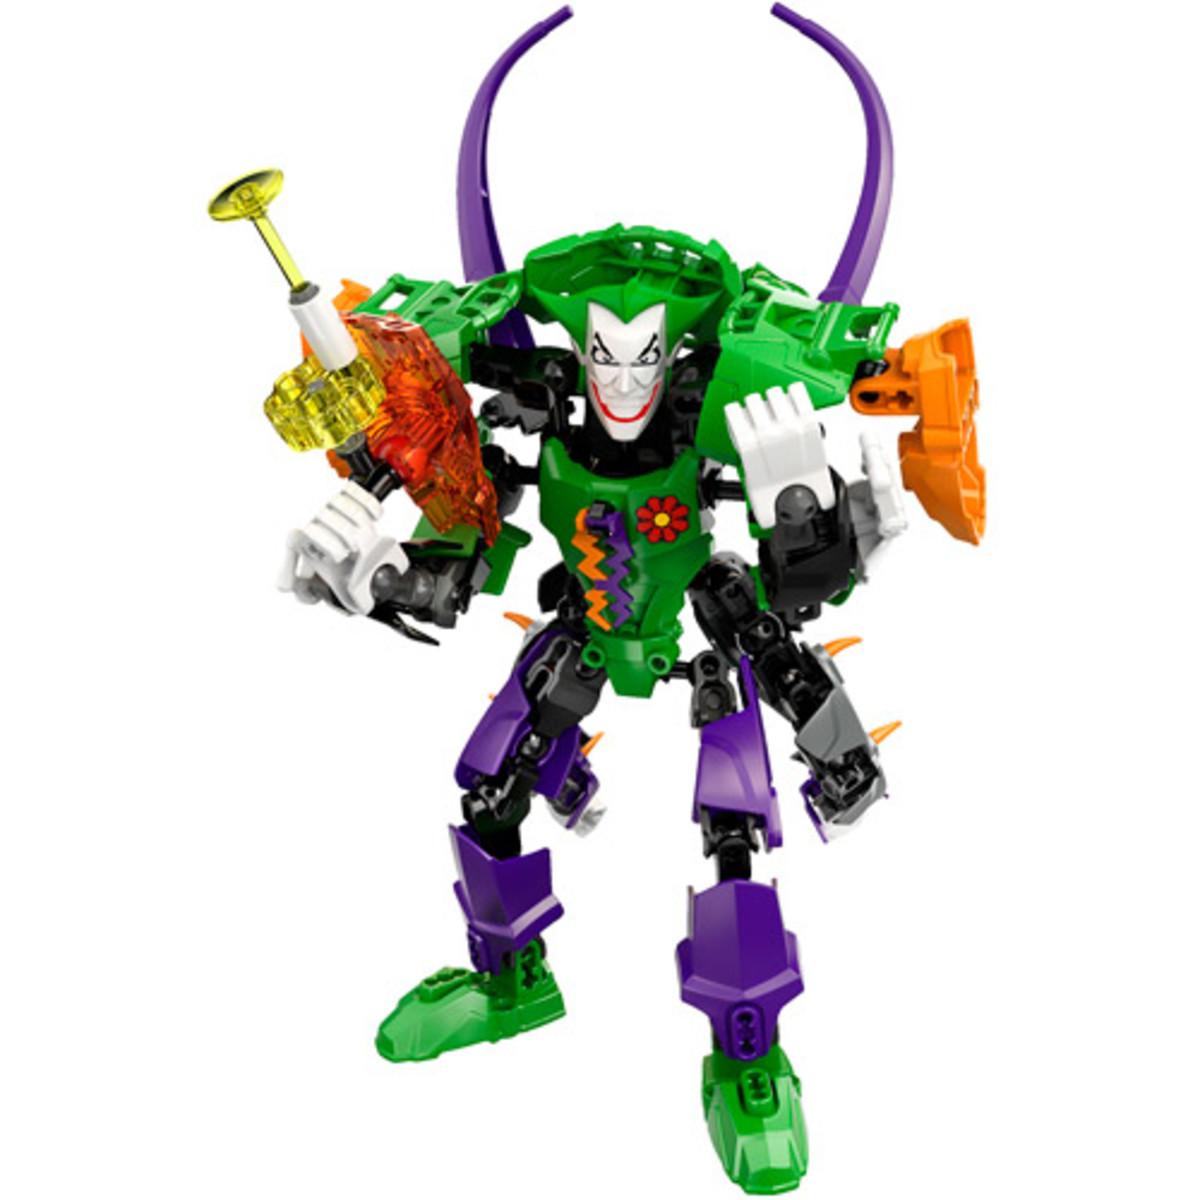 LEGO Ultrabuild Super Heroes Joker 4527 and Ultrabuild Green Lantern 4528 Combo